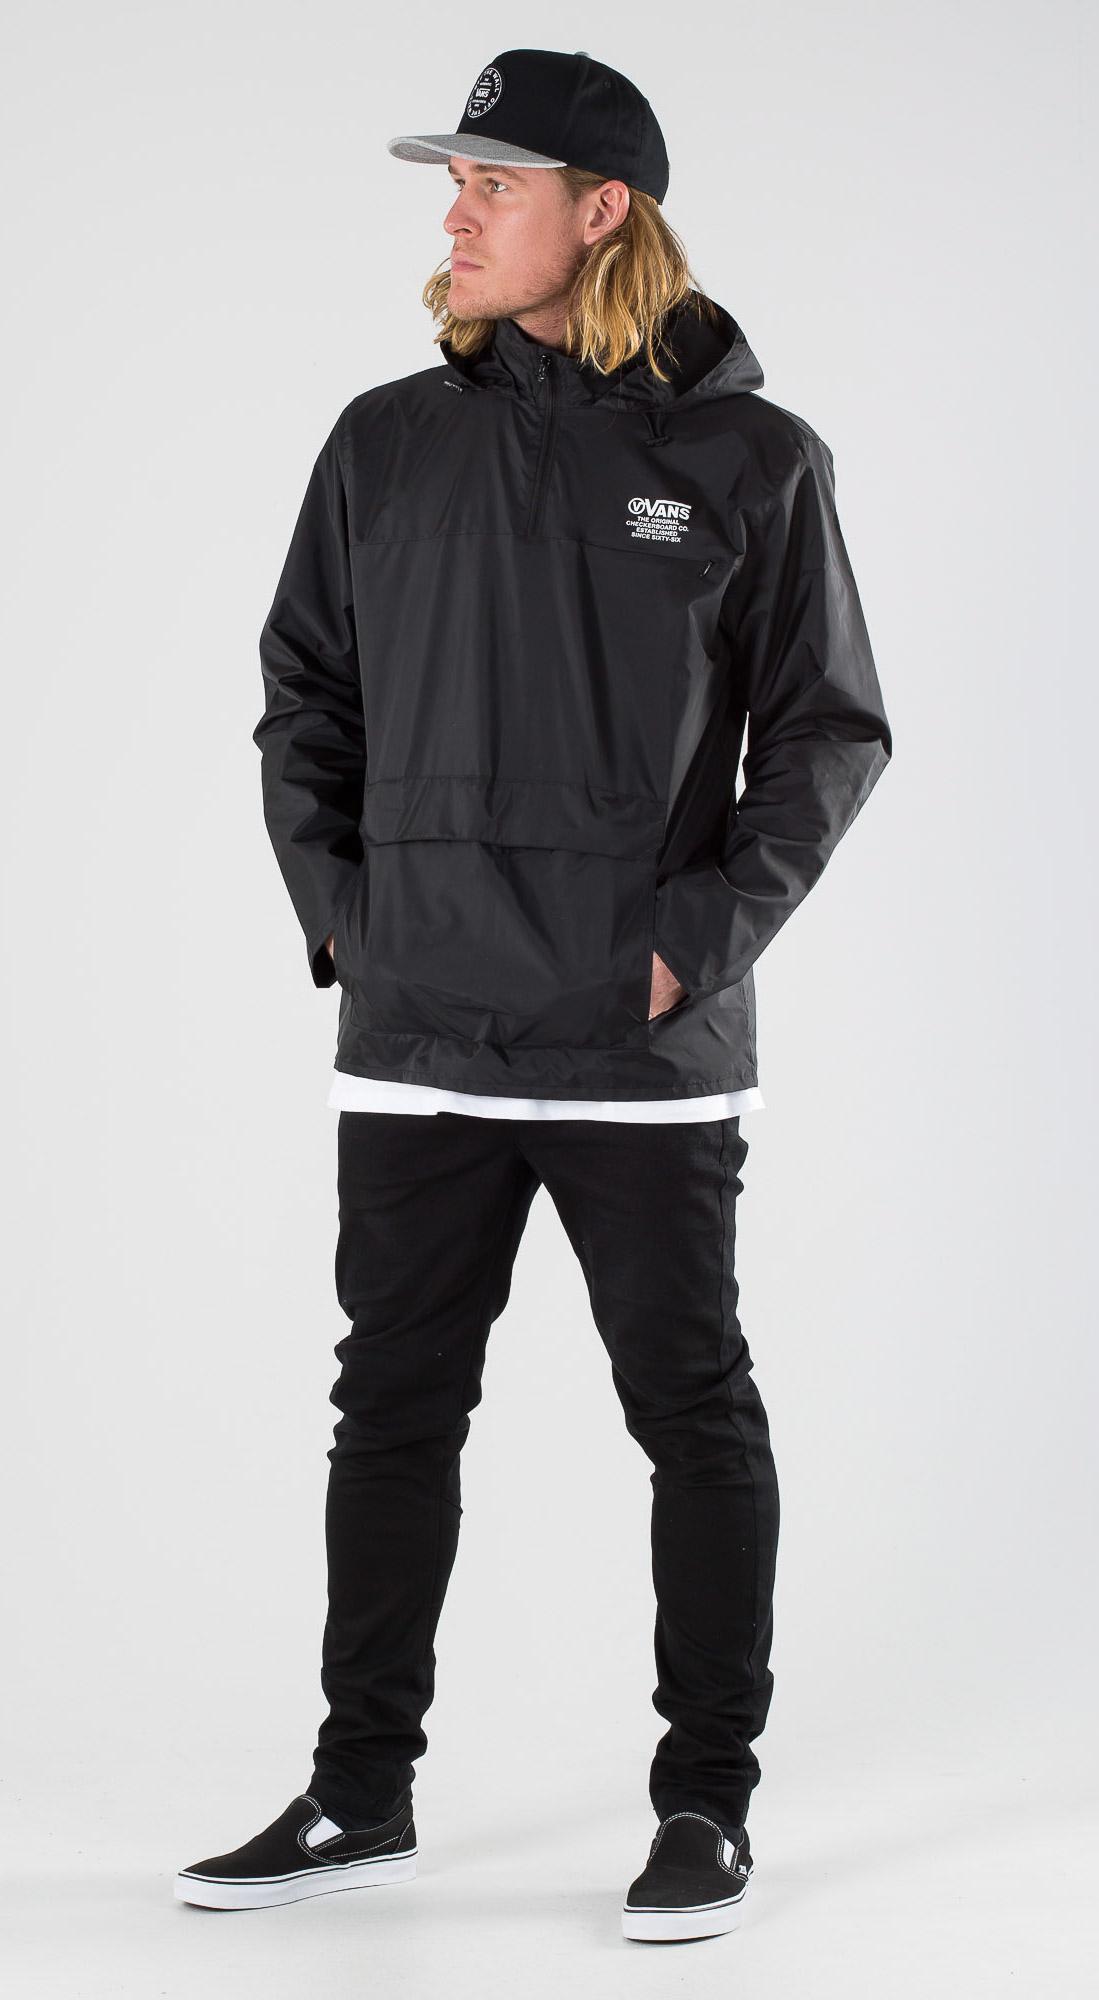 Vans Distort Type Anorak Black Outfit